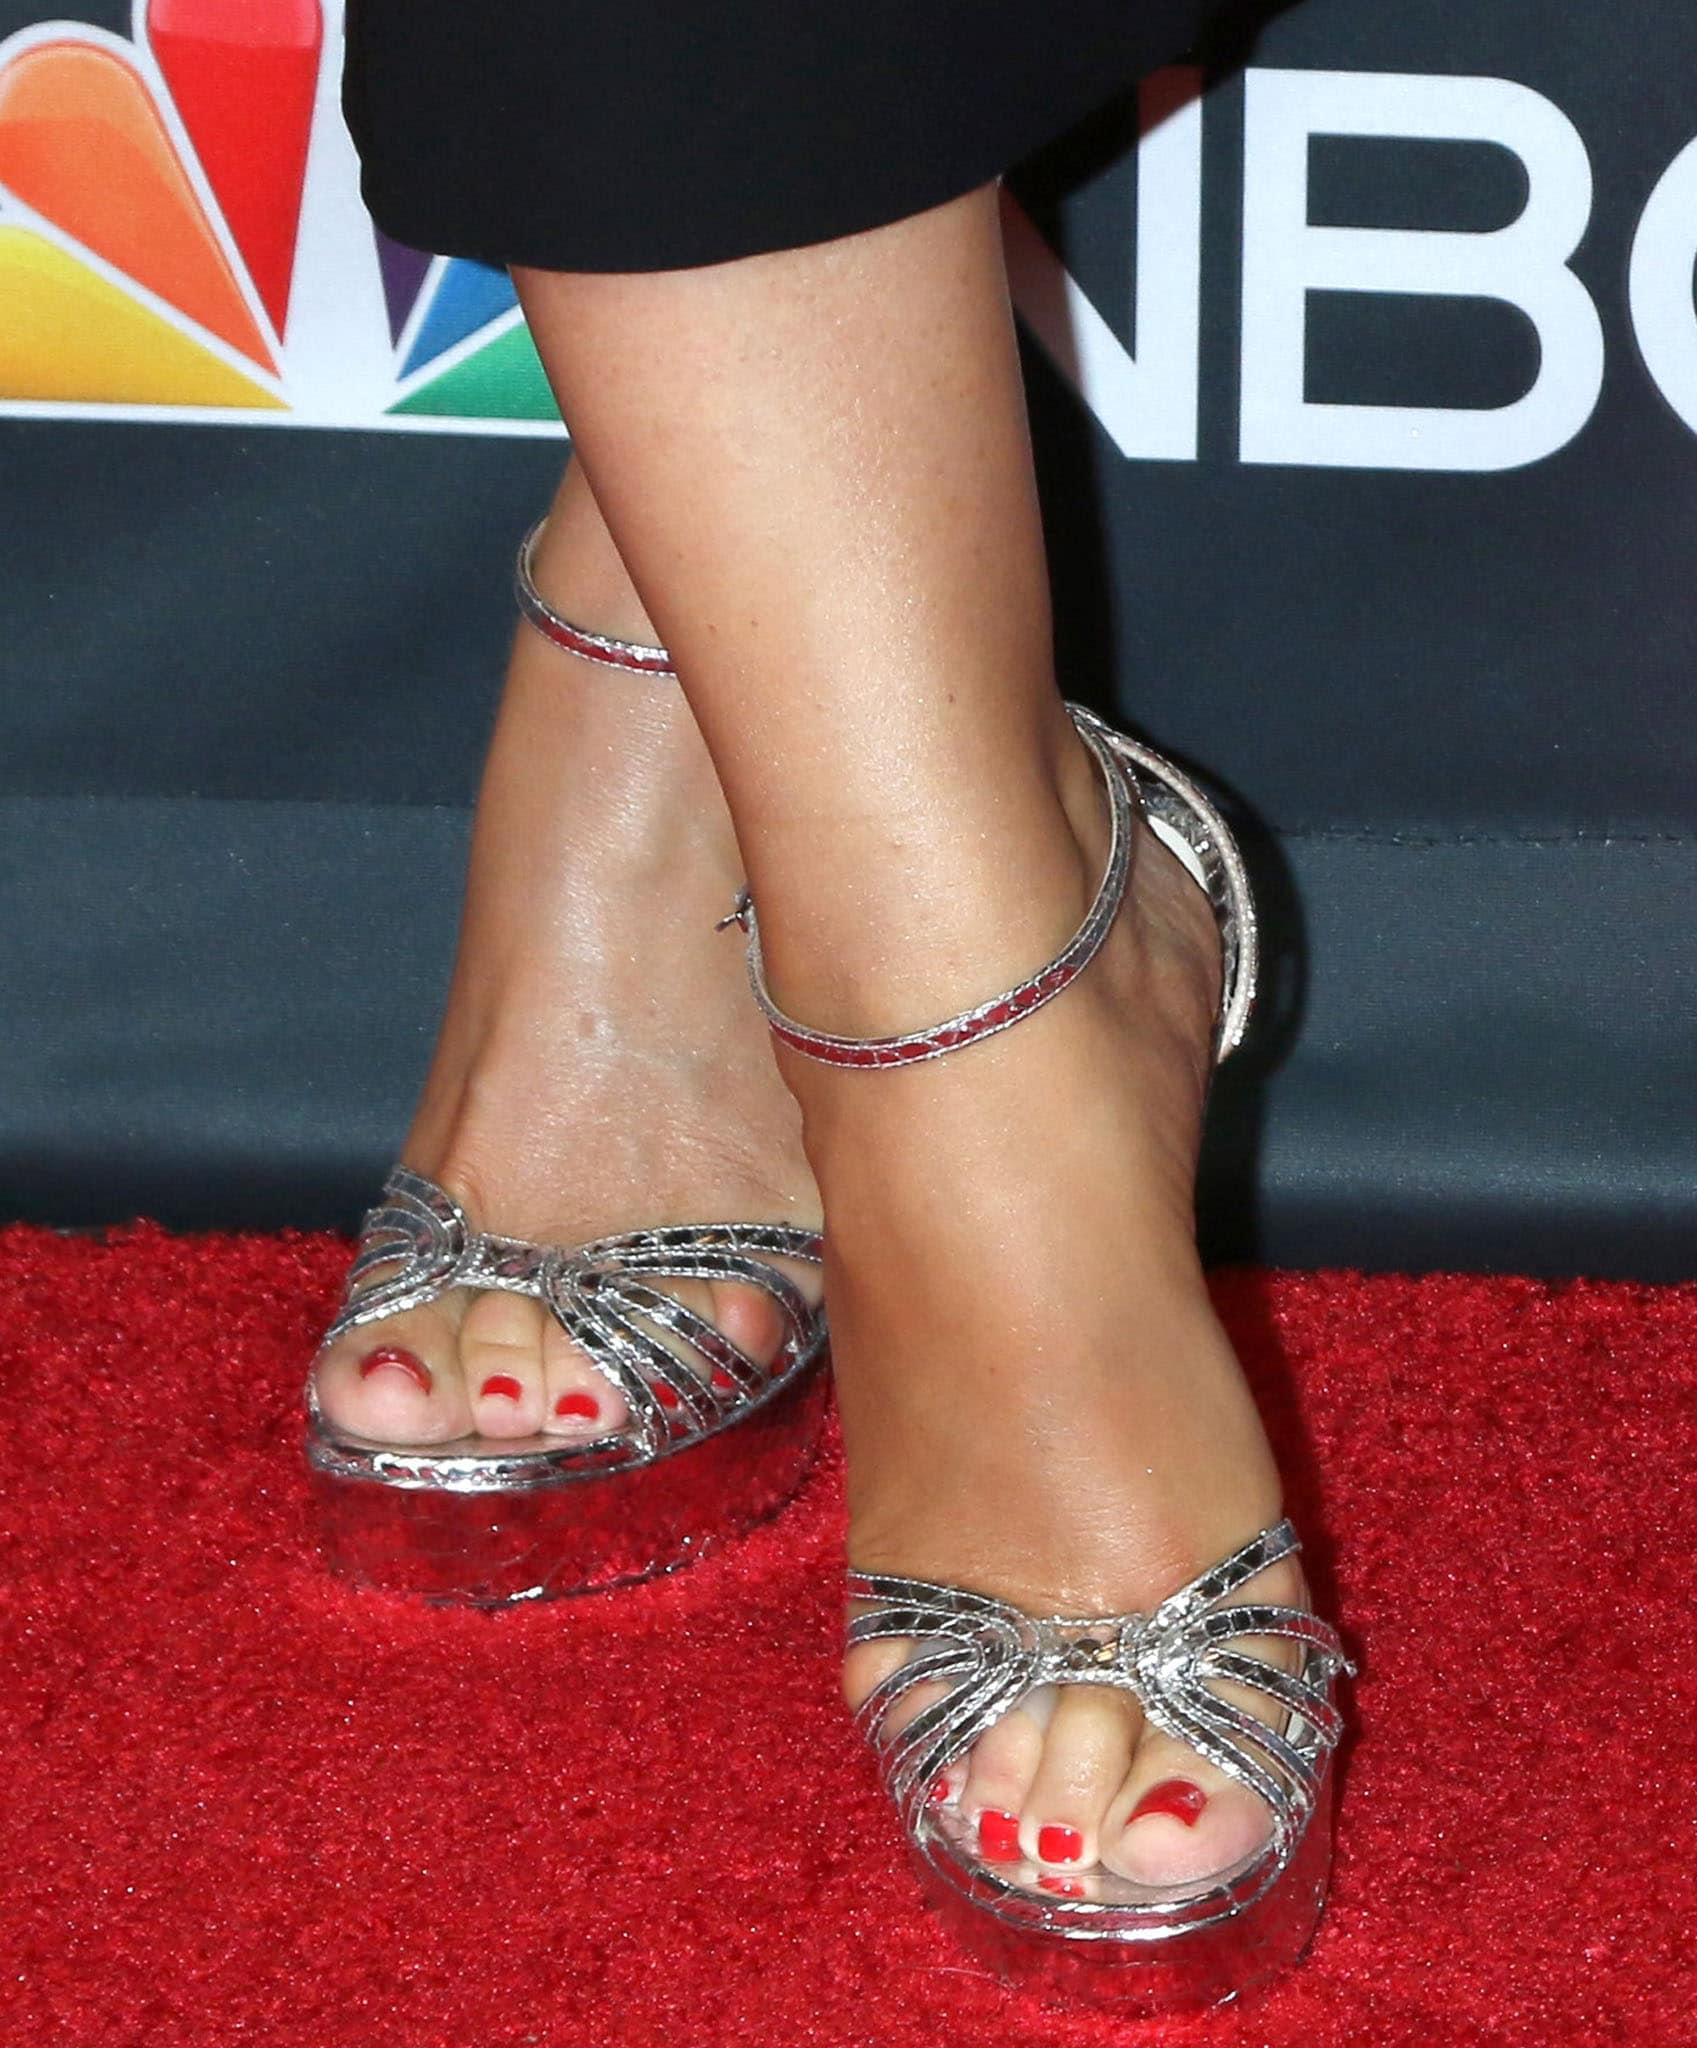 Sofia Vergara shows off her red pedicure in textured metallic leather platform sandals